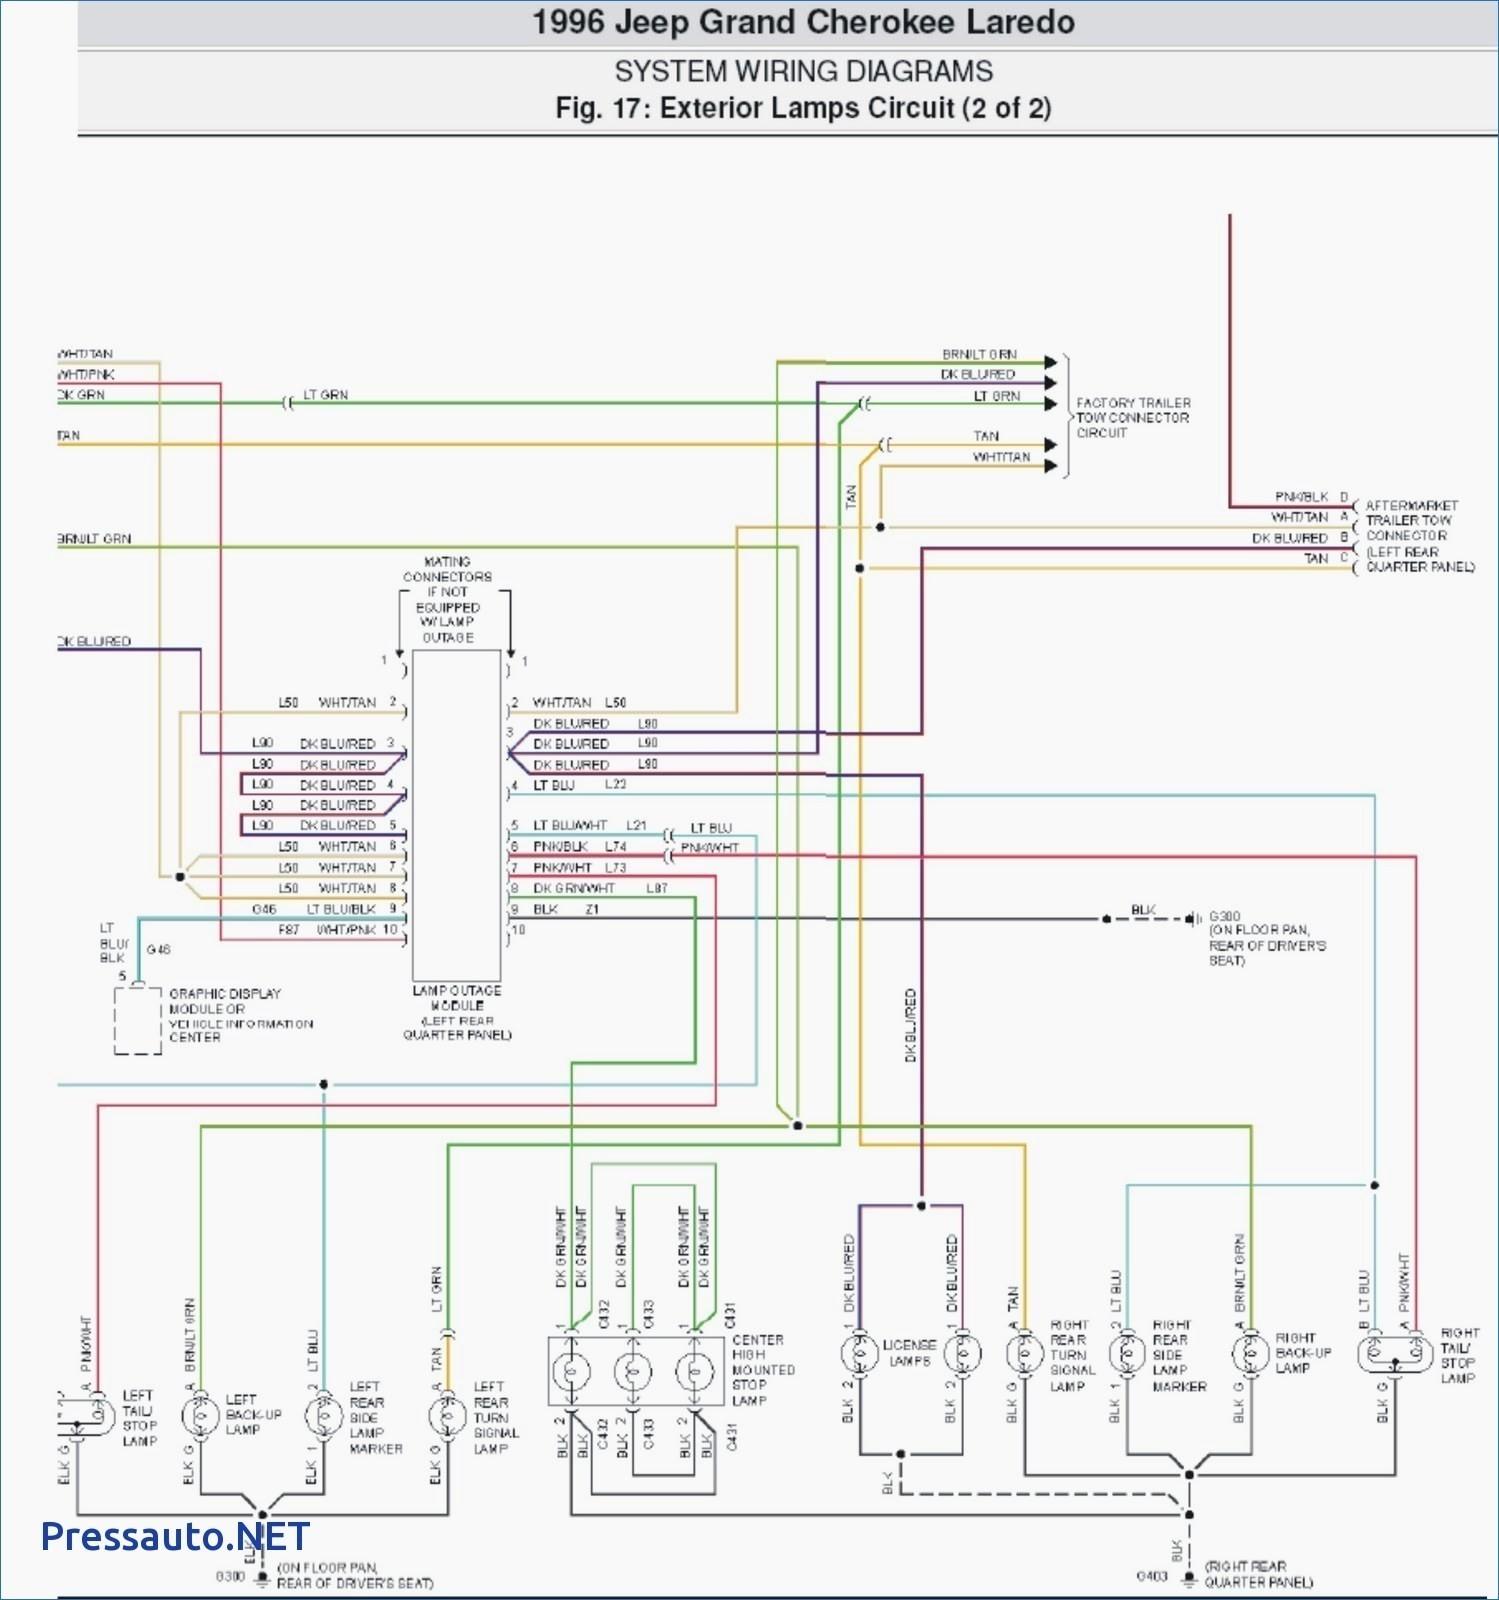 95 Jeep Cherokee Radio Wiring Diagram | Free Wiring Diagram Jeep Cherokee Sport Heater Wiring Diagram on